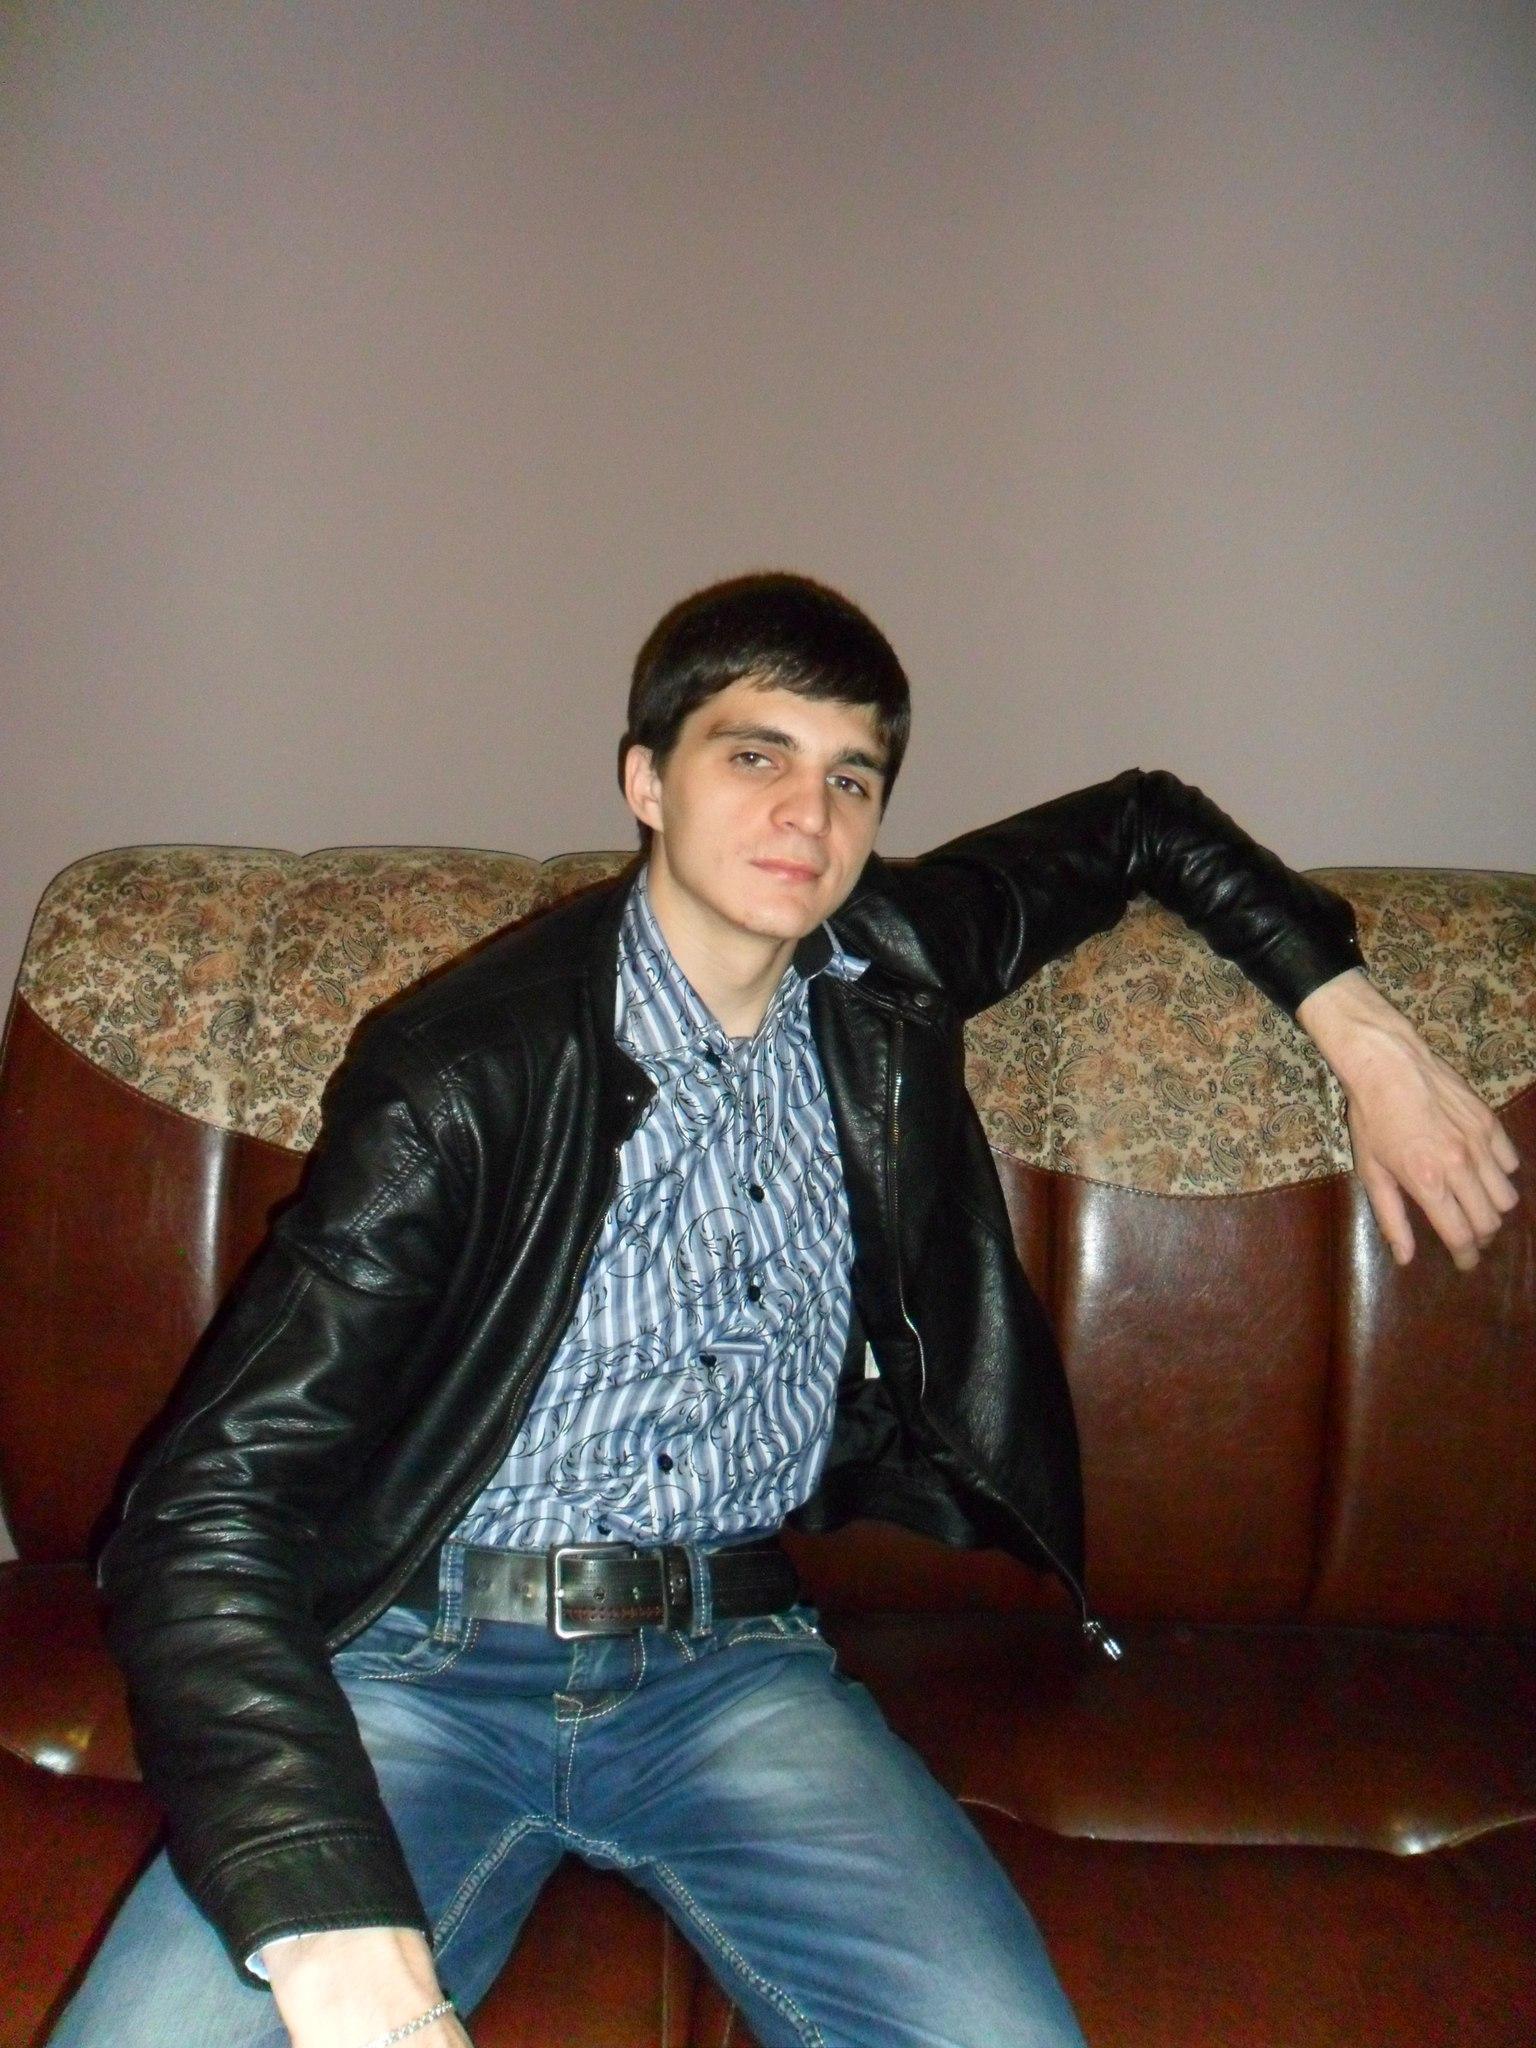 Нсо гей знакомства татарск